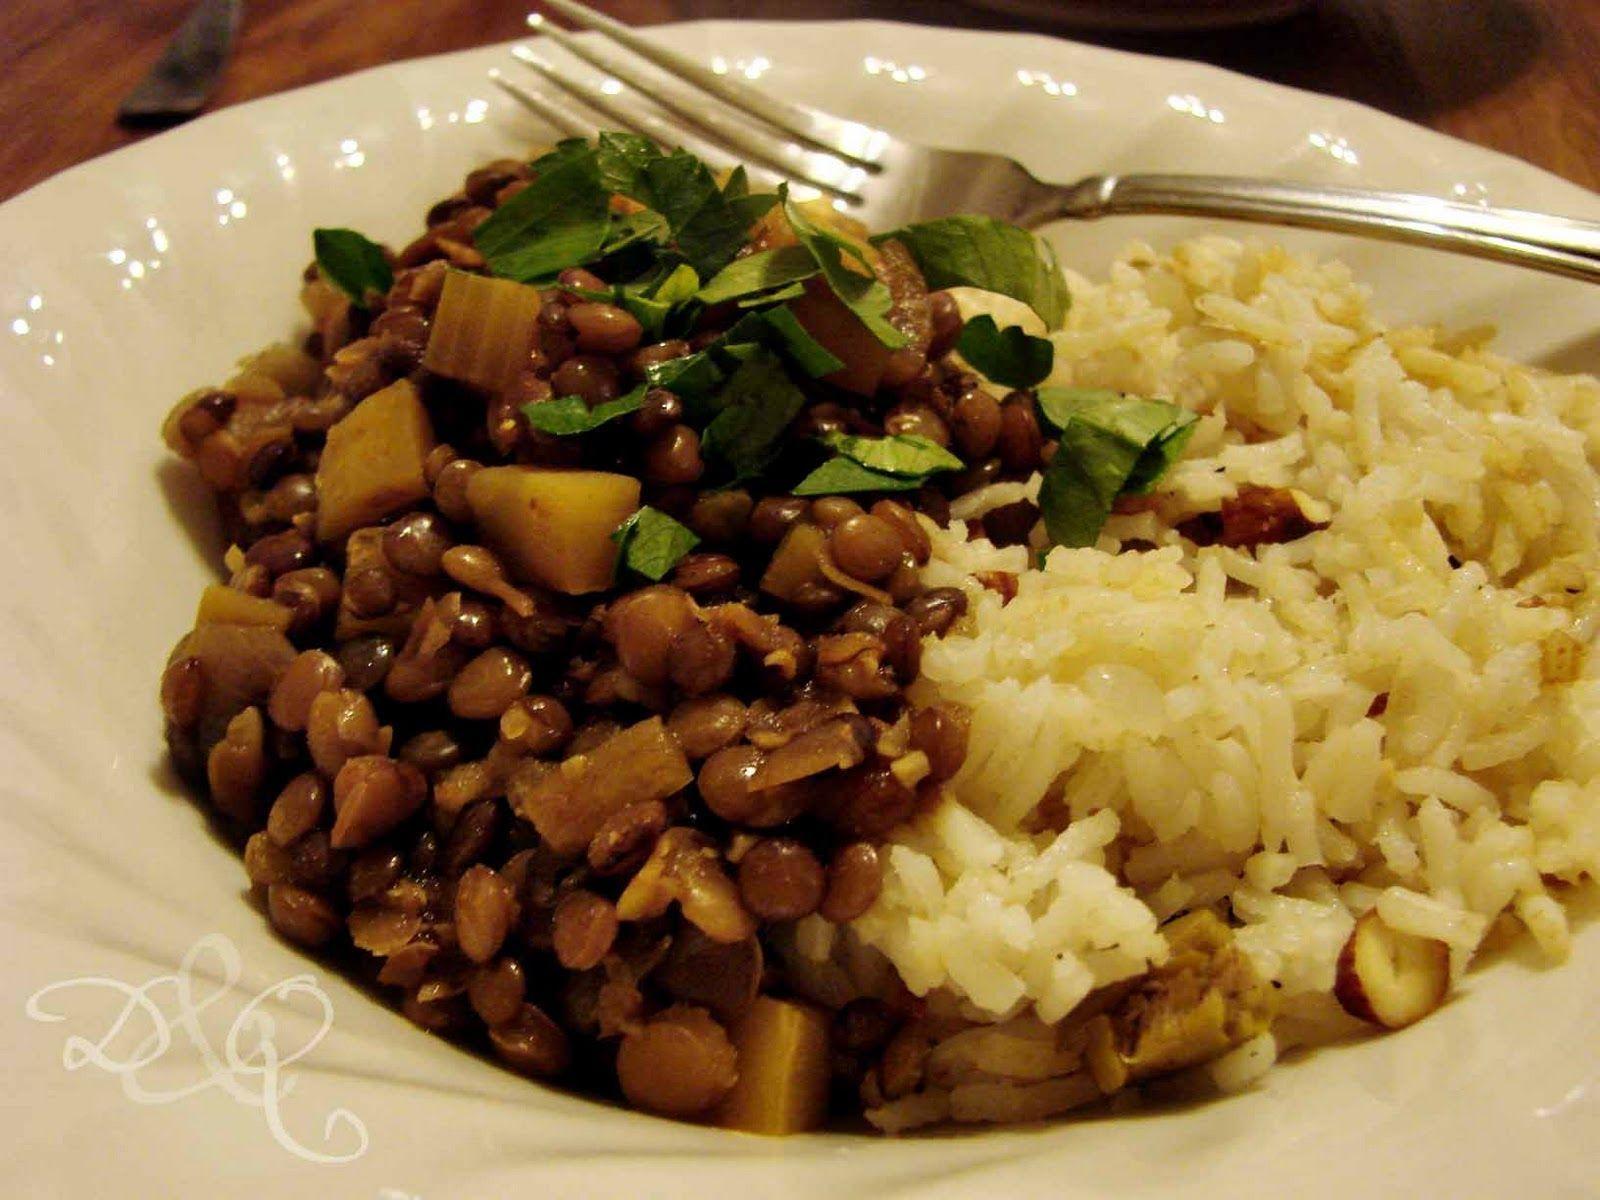 MARK BITTMAN RECIPES Braised Spanish Lentils - based on Mark Bittman's recipe (Vegetarian/Vegan with Vegetable Stock) #markbittmanrecipes MARK BITTMAN RECIPES Braised Spanish Lentils - based on Mark Bittman's recipe (Vegetarian/Vegan with Vegetable Stock) #markbittmanrecipes MARK BITTMAN RECIPES Braised Spanish Lentils - based on Mark Bittman's recipe (Vegetarian/Vegan with Vegetable Stock) #markbittmanrecipes MARK BITTMAN RECIPES Braised Spanish Lentils - based on Mark Bittman's recipe (Vegetar #markbittmanrecipes